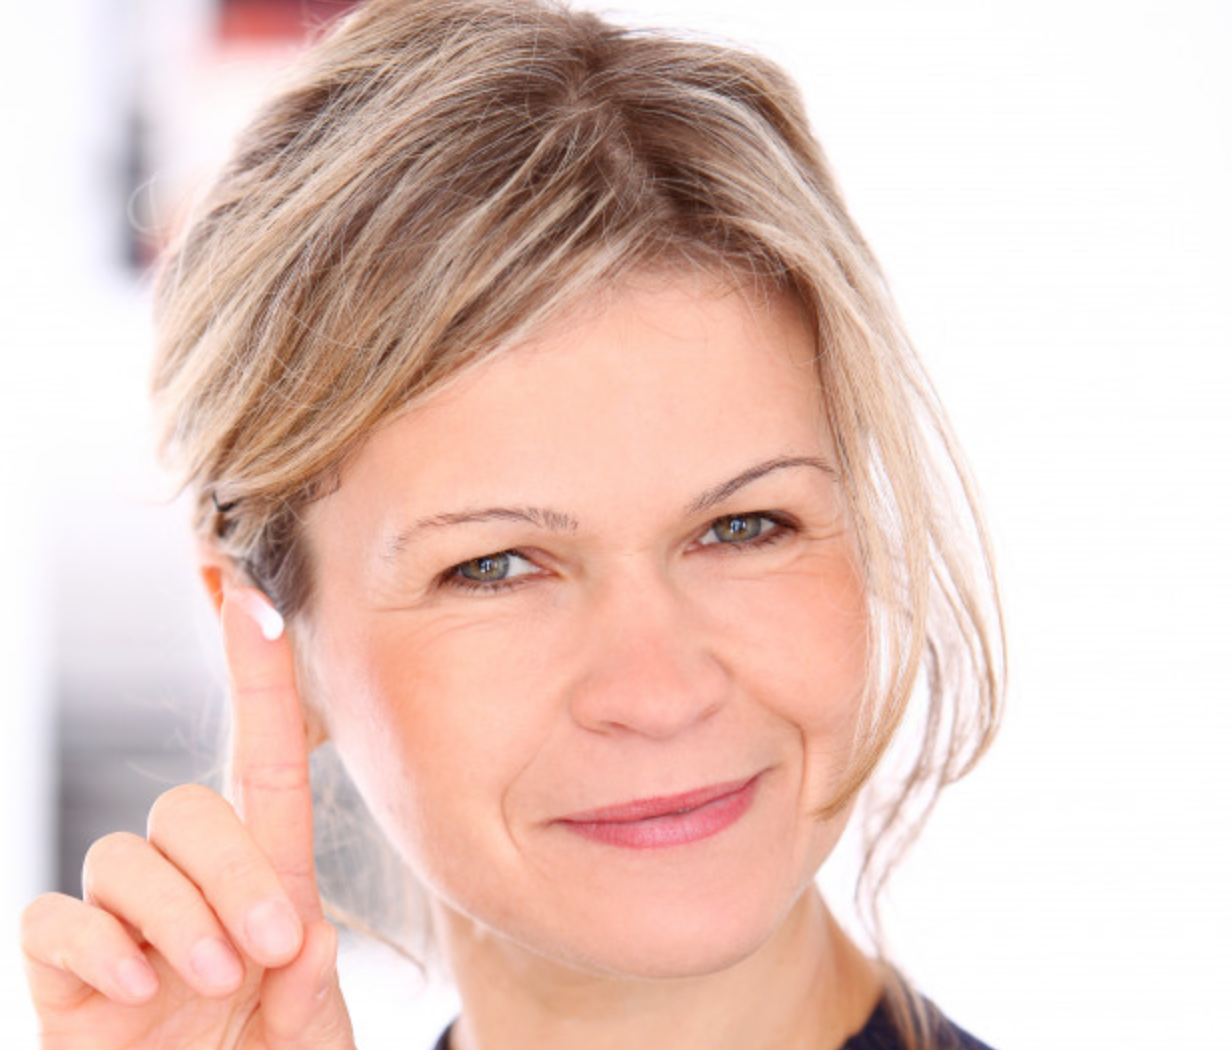 mejor serum antiarrugas mujeres 50 anos